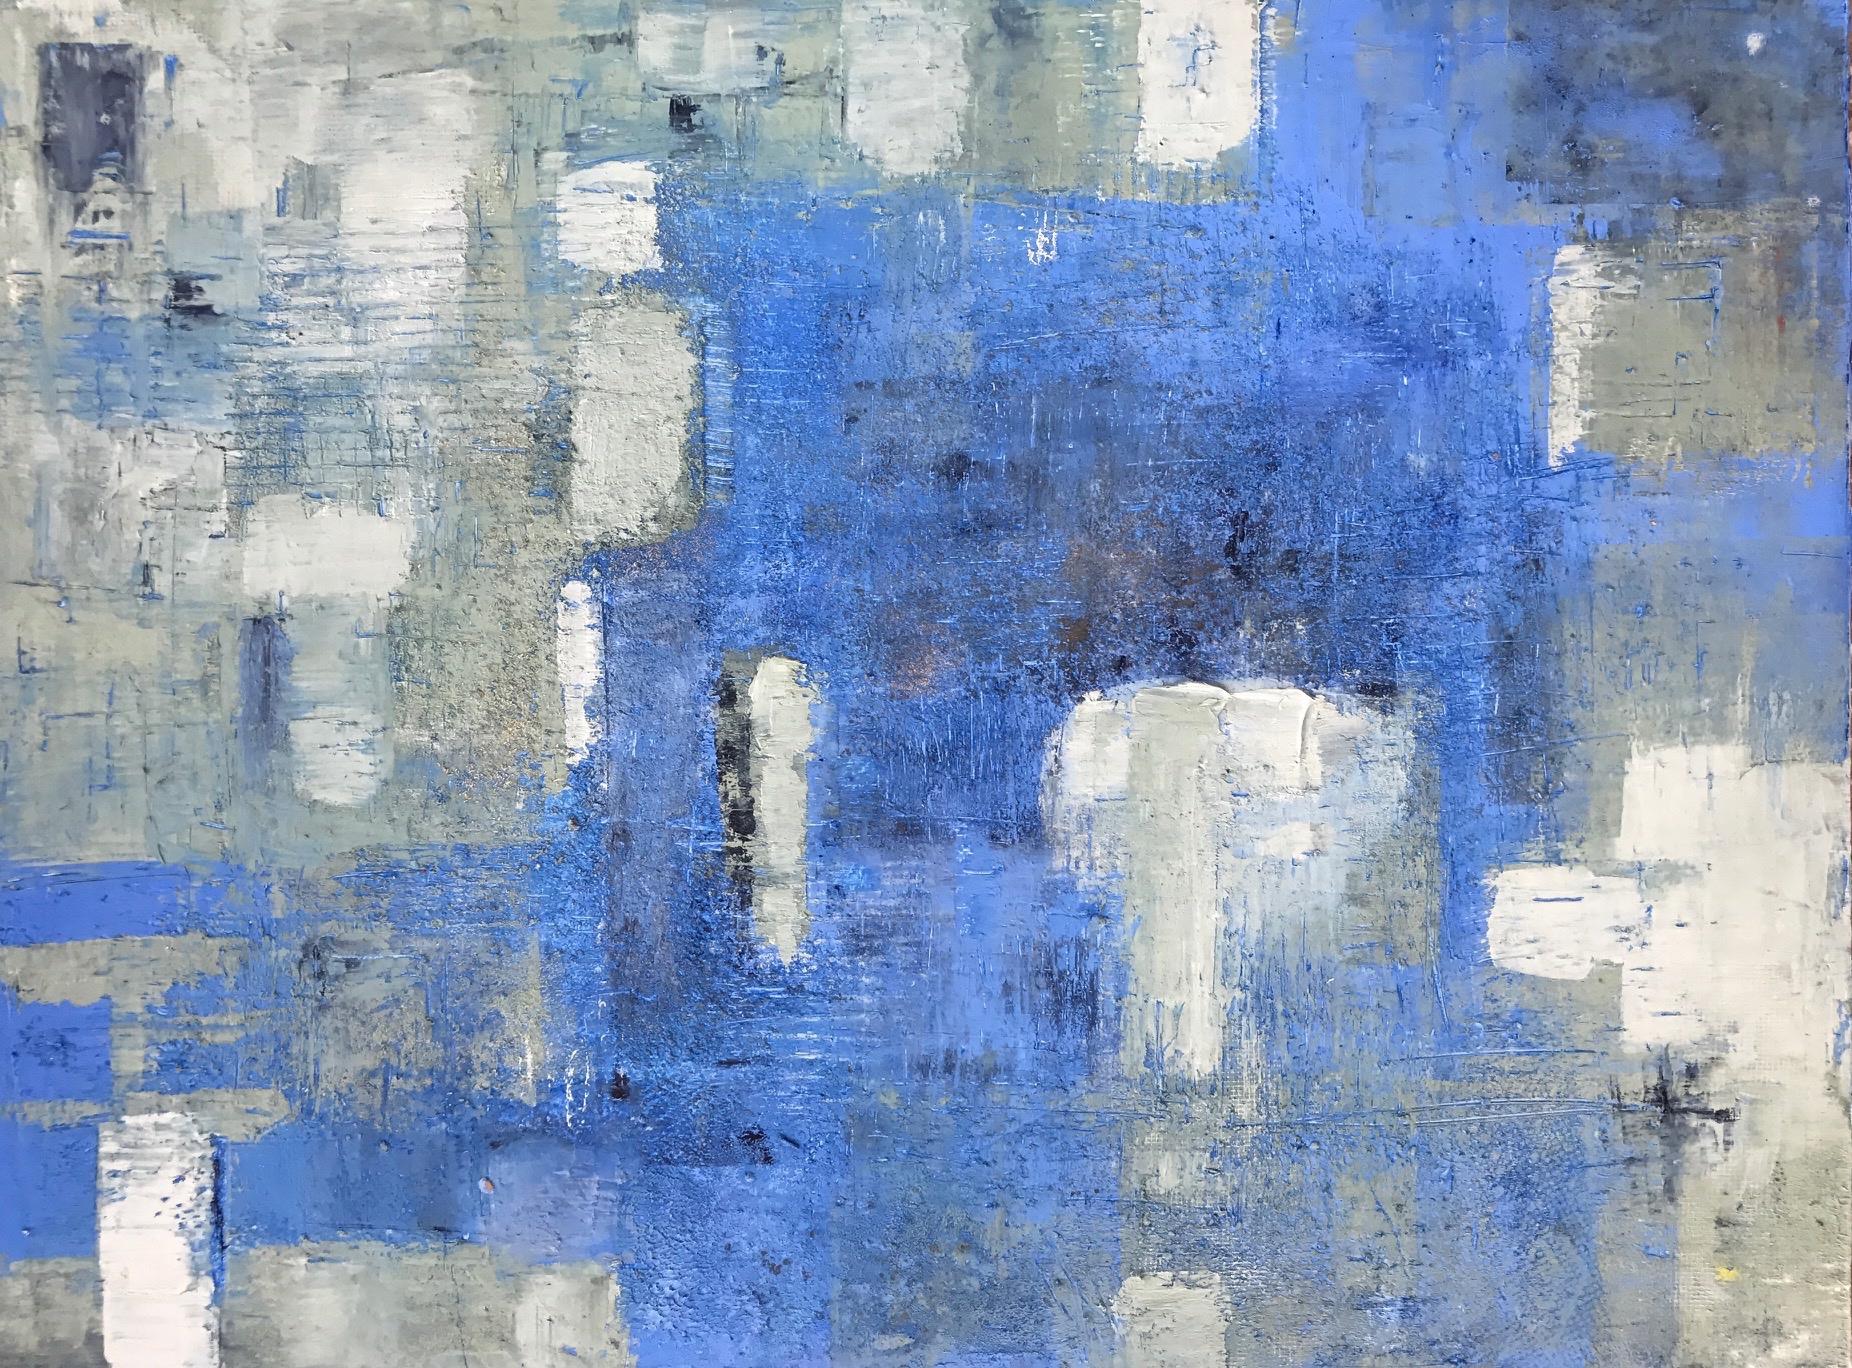 Blue Haze II 18 x 24